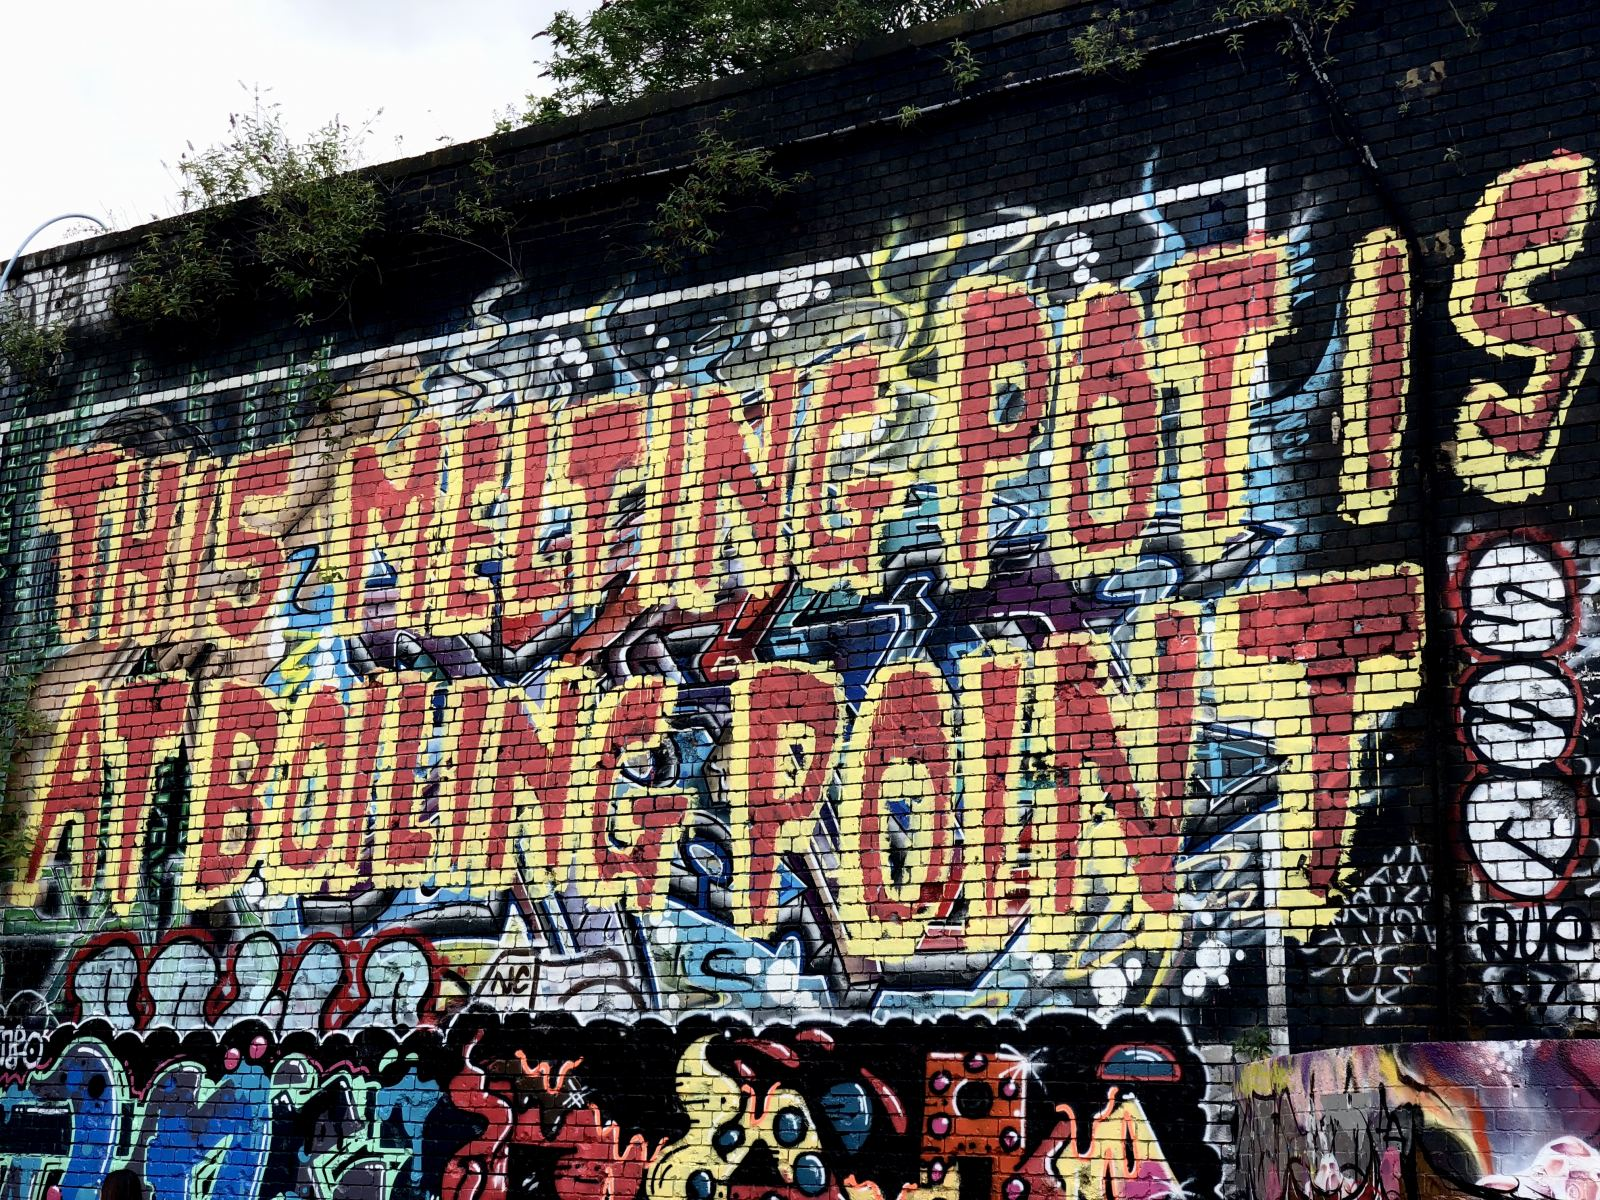 Shoreditch Street Art: This Melting Pot is at boiling Point street art on the Shoreditch overpass